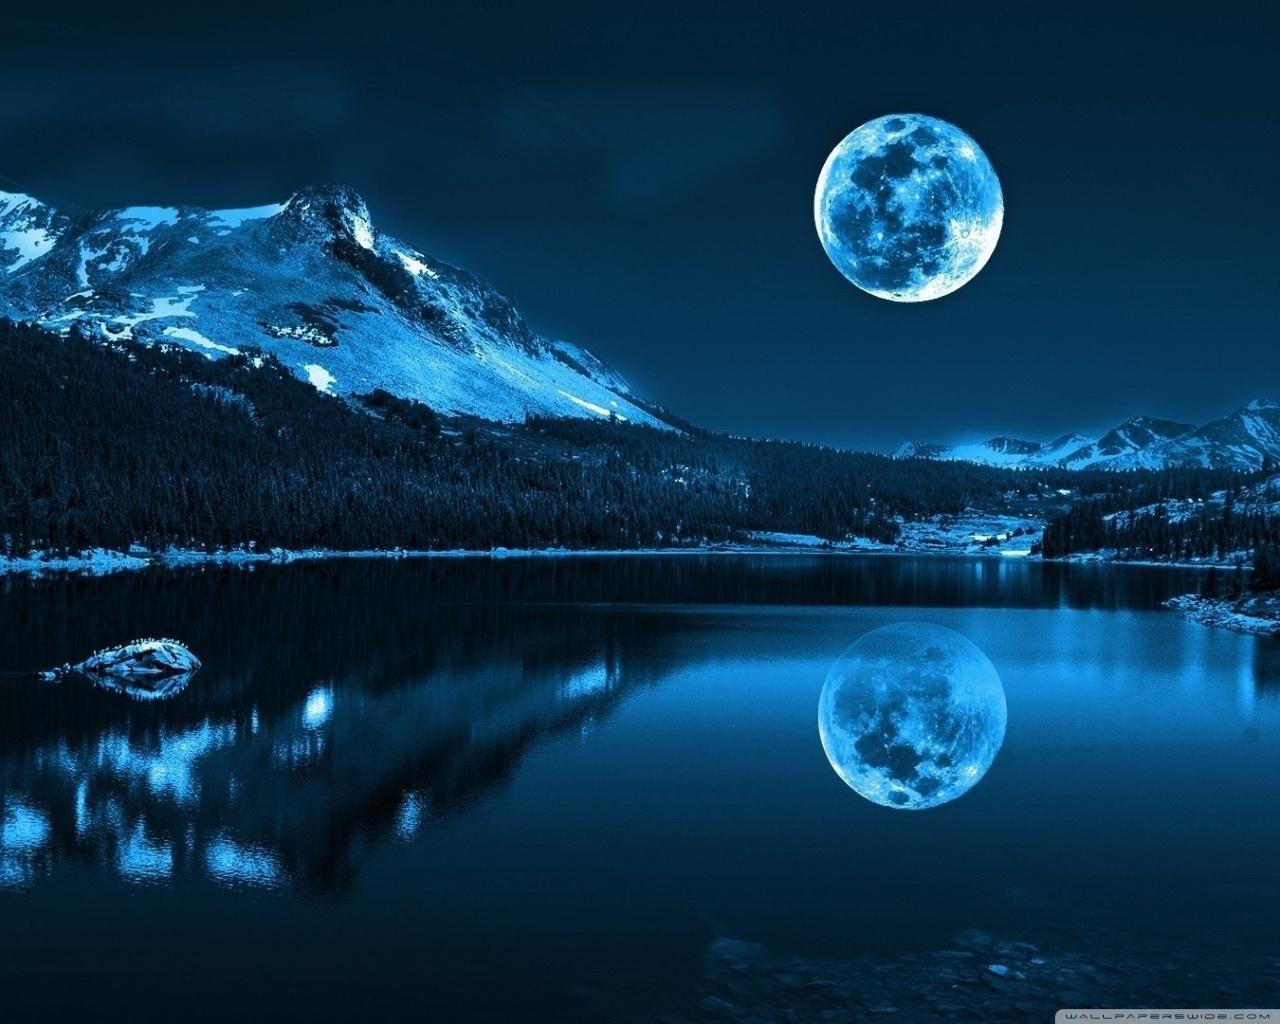 moonlight night ❤ 4k hd desktop wallpaper for 4k ultra hd tv • wide